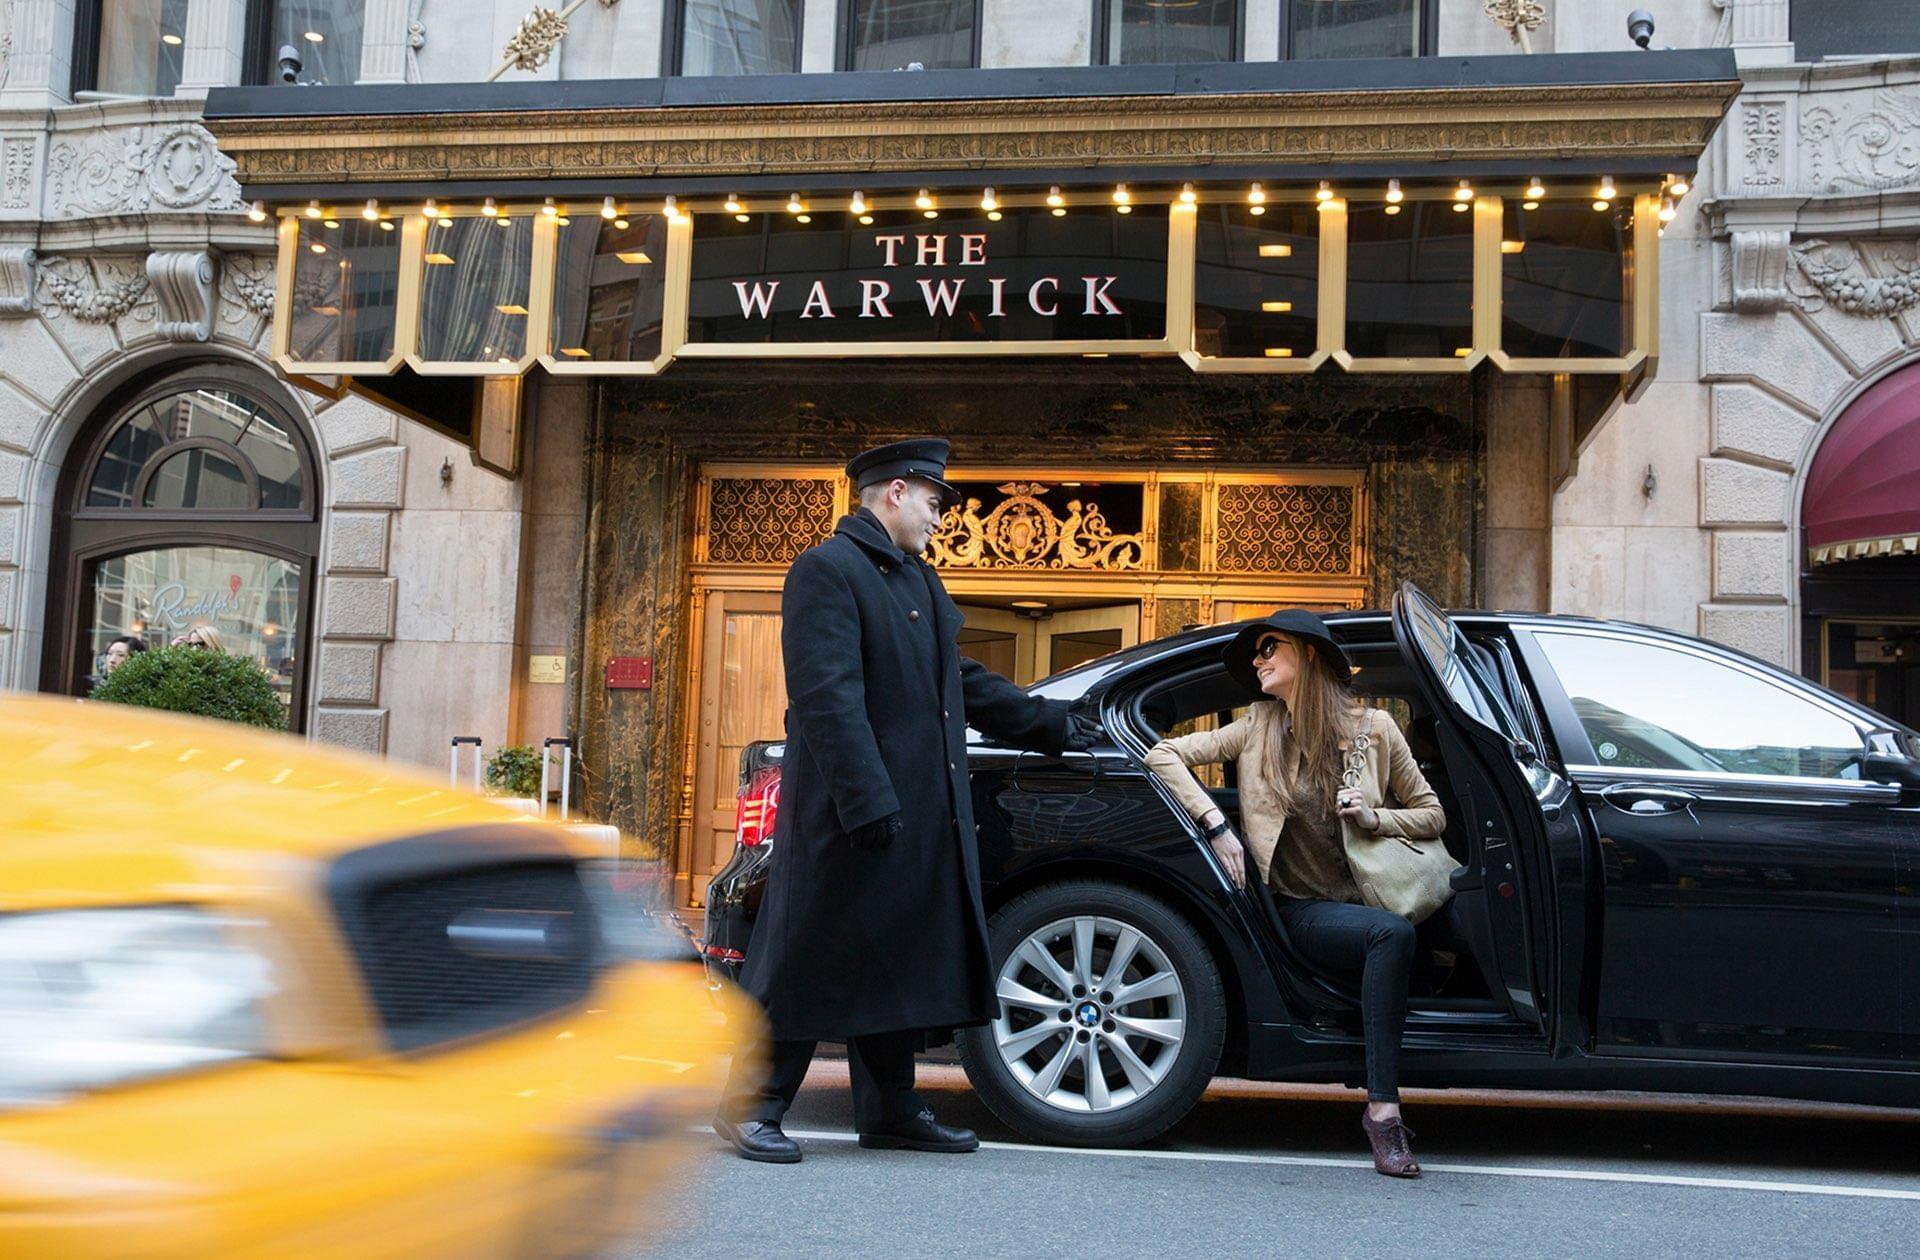 Warwick New York Front